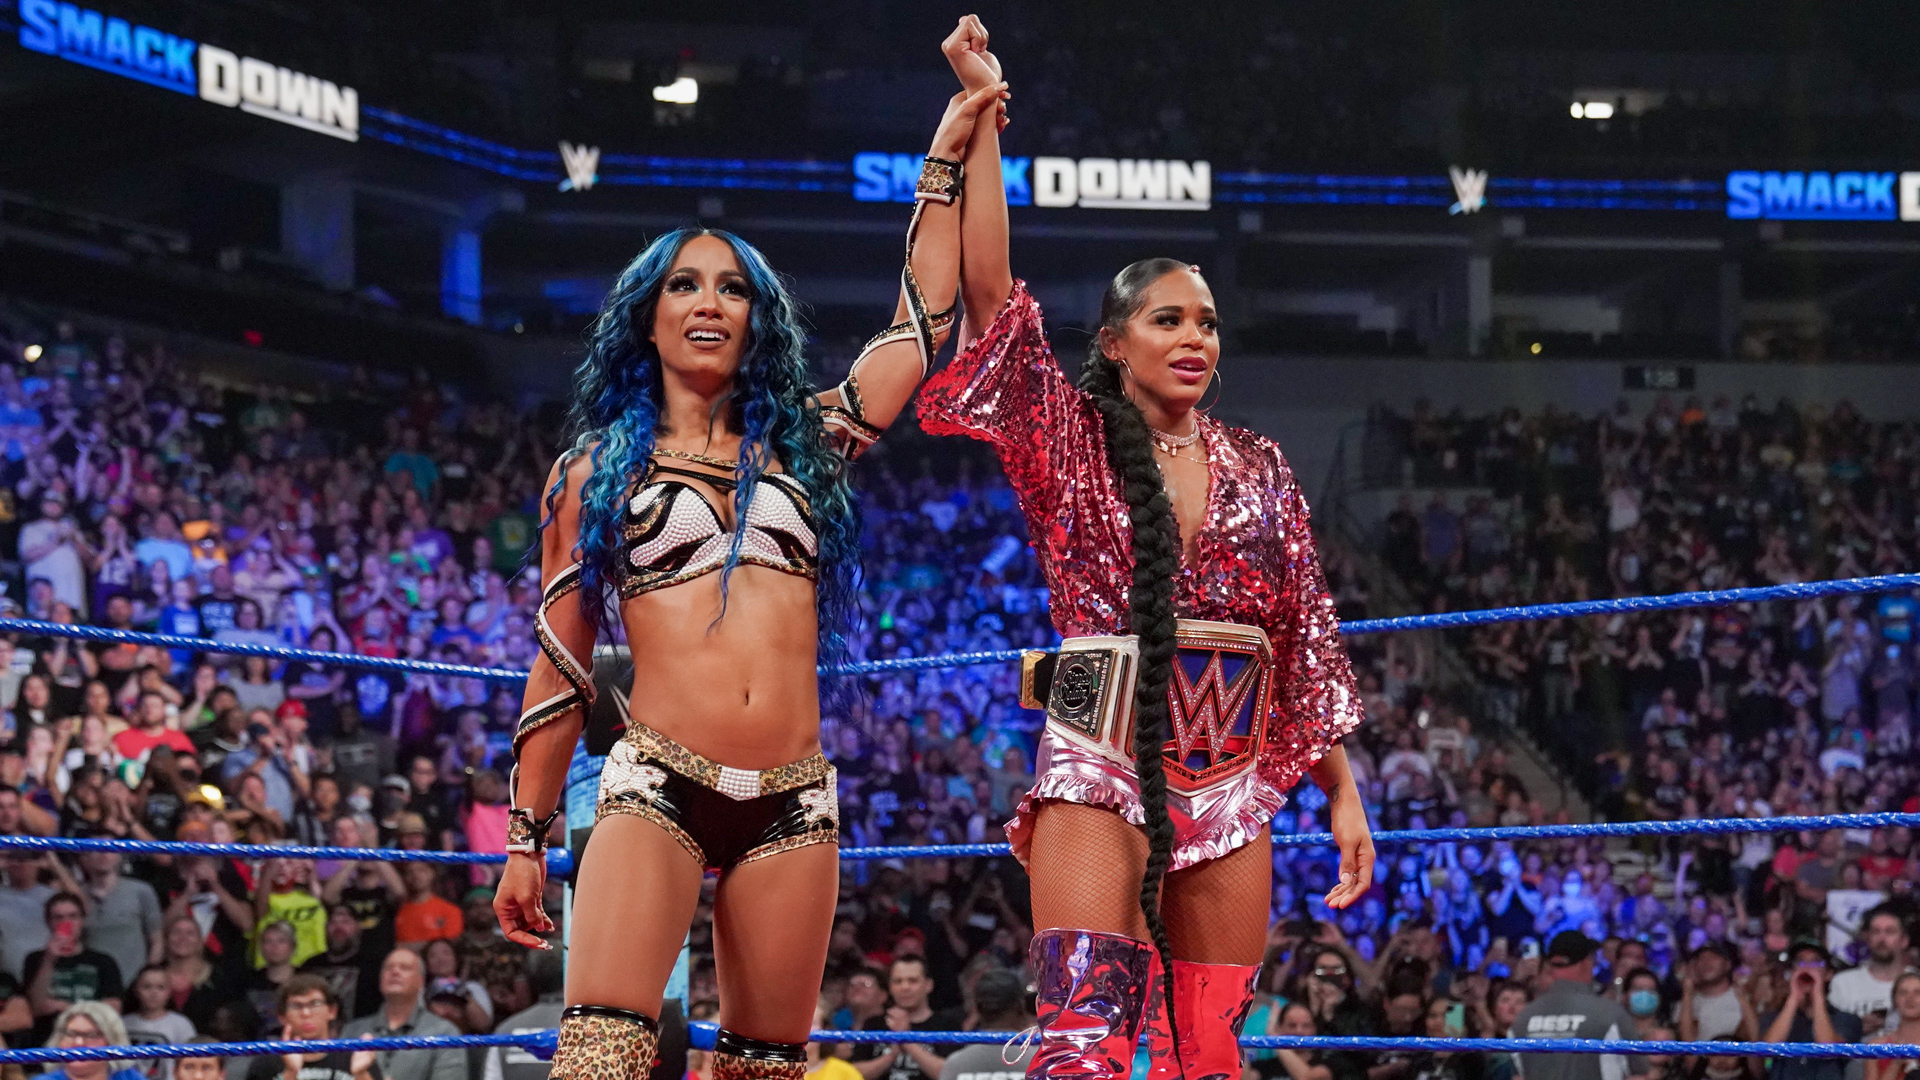 Sasha Banks vs. Bianca Belair Still On For WWE SummerSlam 2021 After Recent Speculations 116